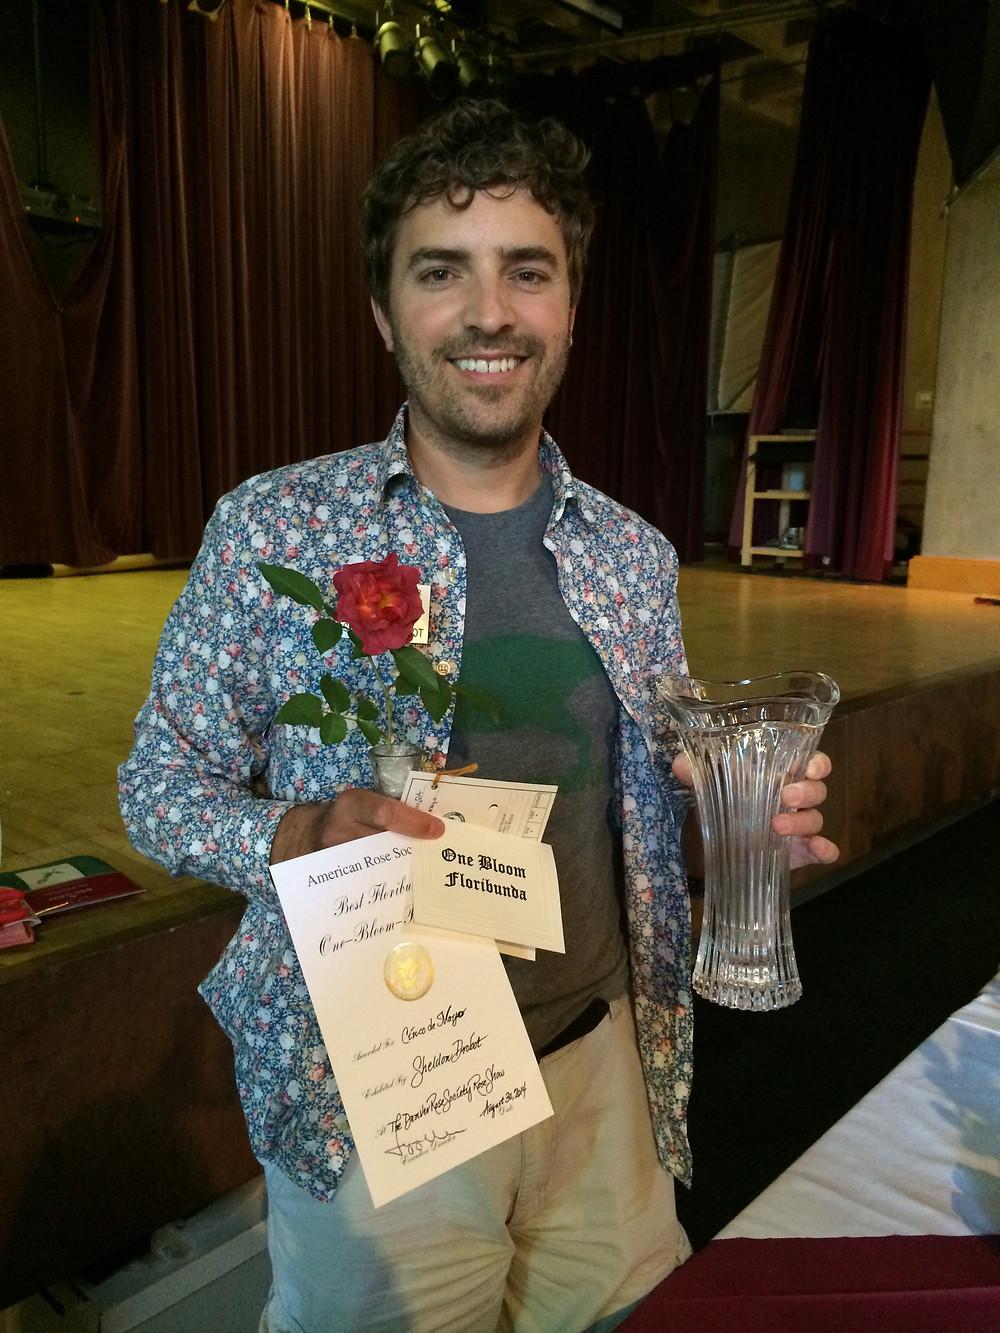 Sheldon with a his winning floribunda at the Boulder Rose Society Rose Show, photo courtesy Sheldon Drobot.